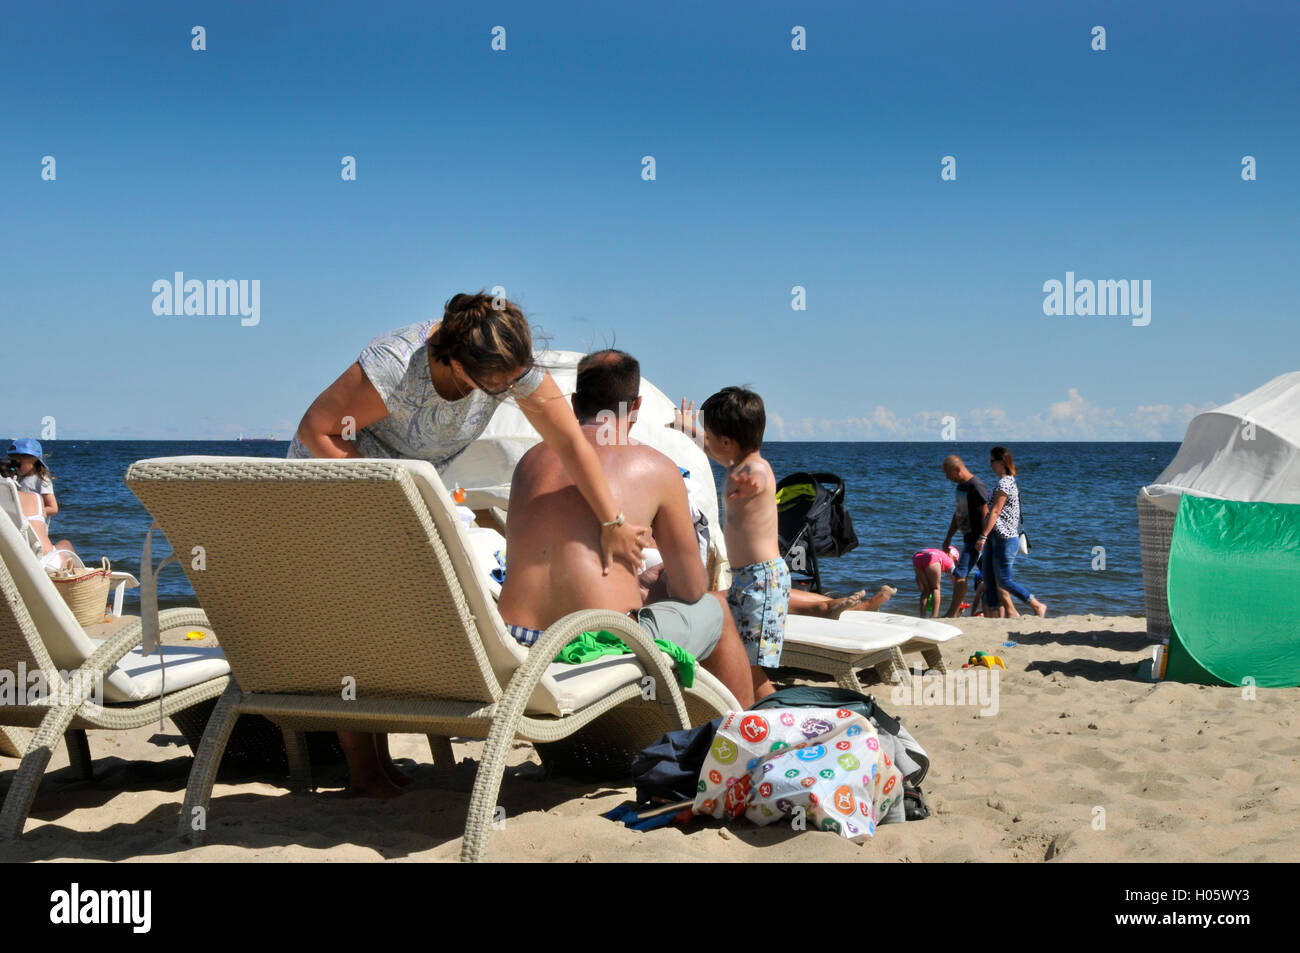 woman applying sun tan lotion to husbands back - Stock Image